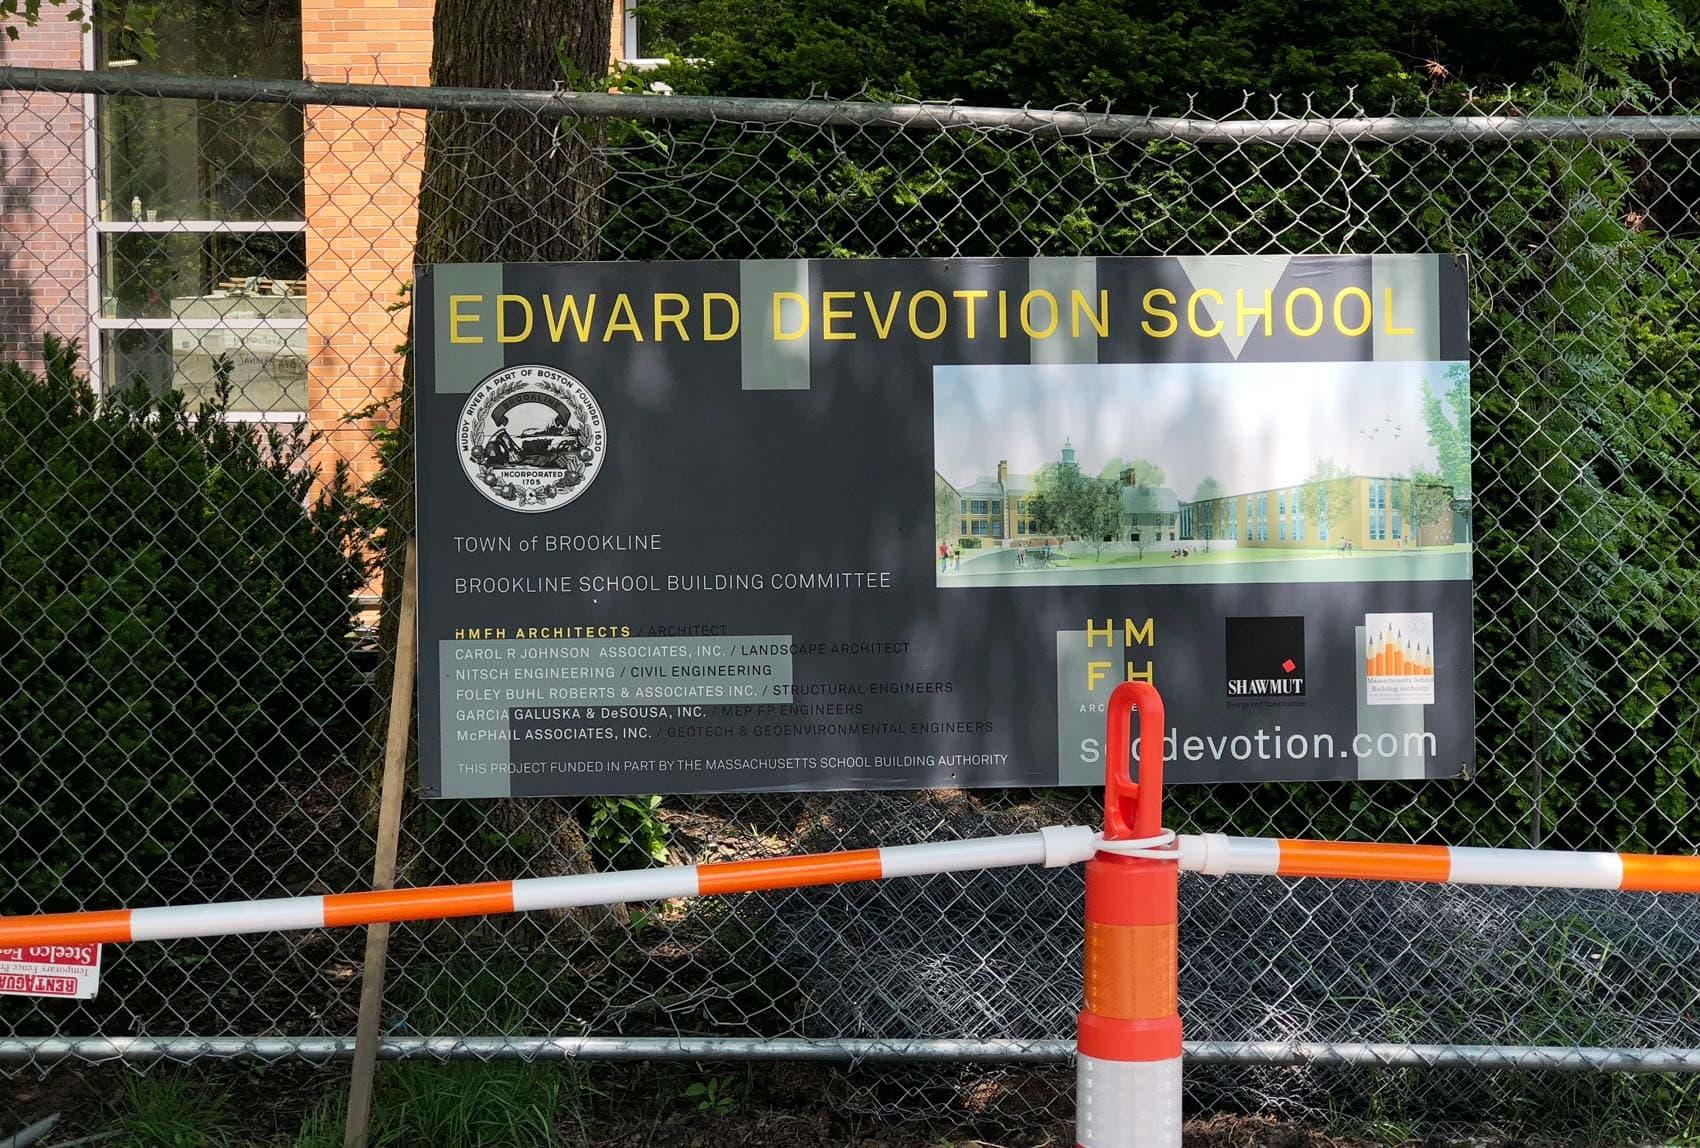 For now, Brookline's Edward S. Devotion School is under construction. (Max Larkin/WBUR)